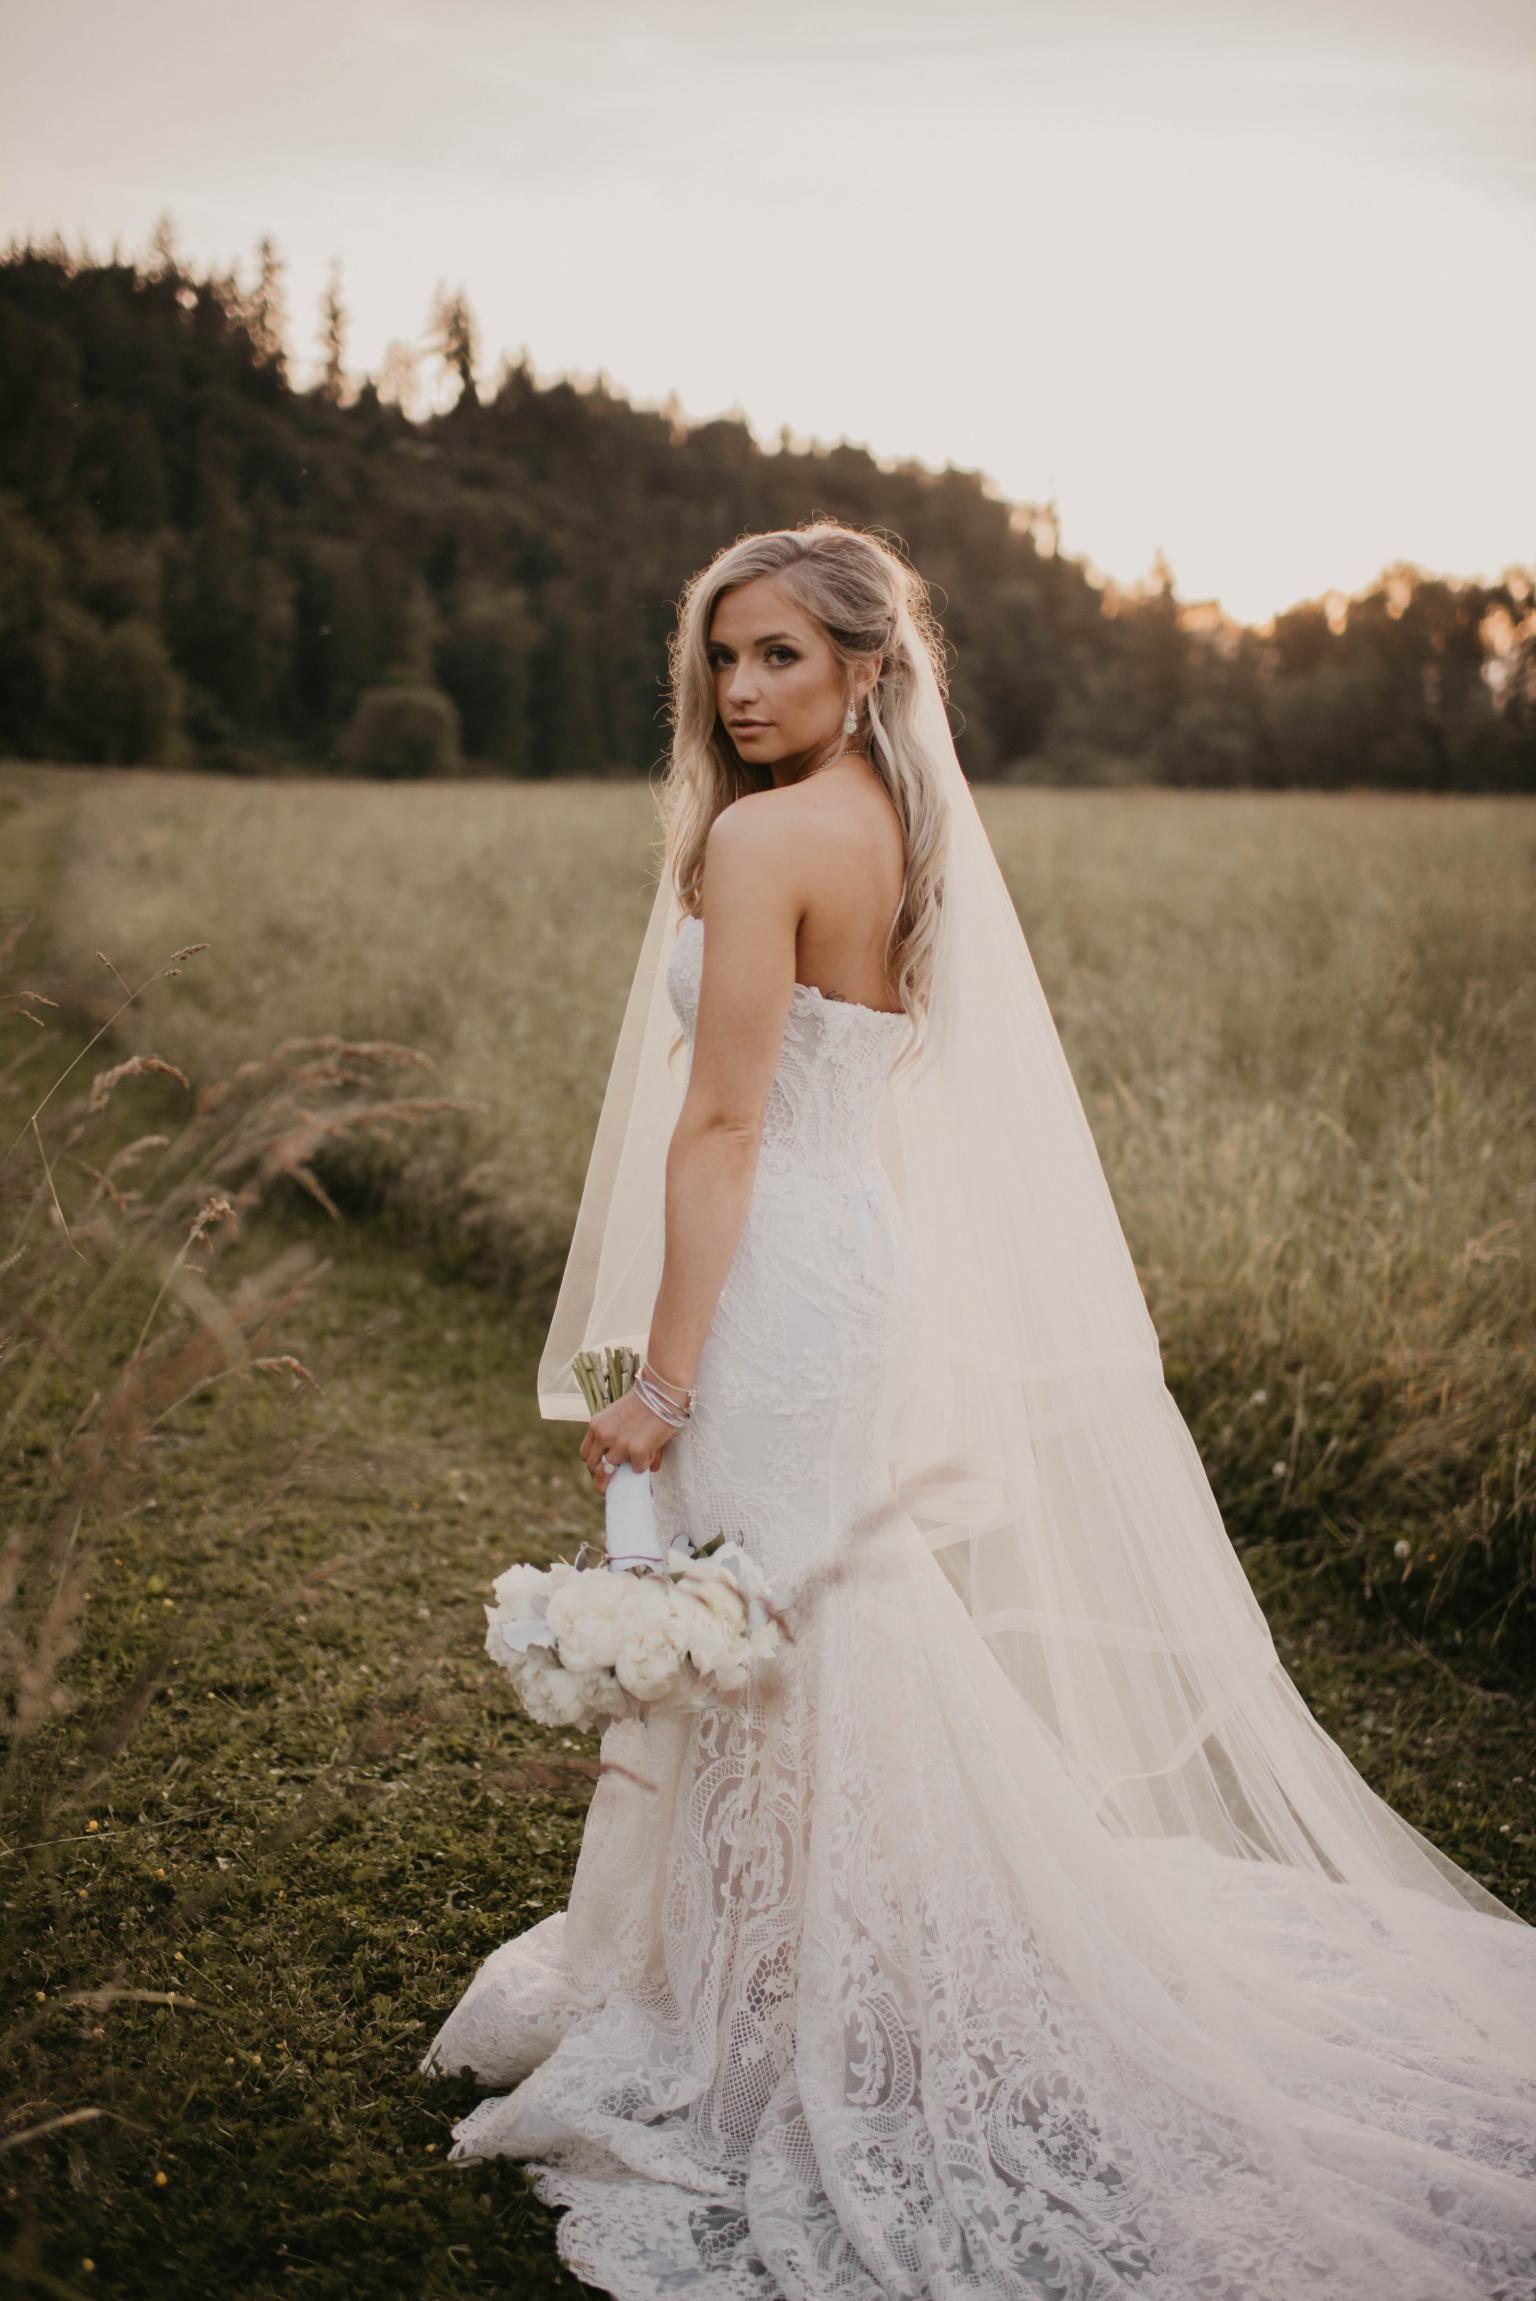 Gala 704 Collection No Ii Bridal Dresses Galia Lahav Wedding Dress Inspiration Wedding Dresses Wedding Dress Couture [ 2301 x 1536 Pixel ]